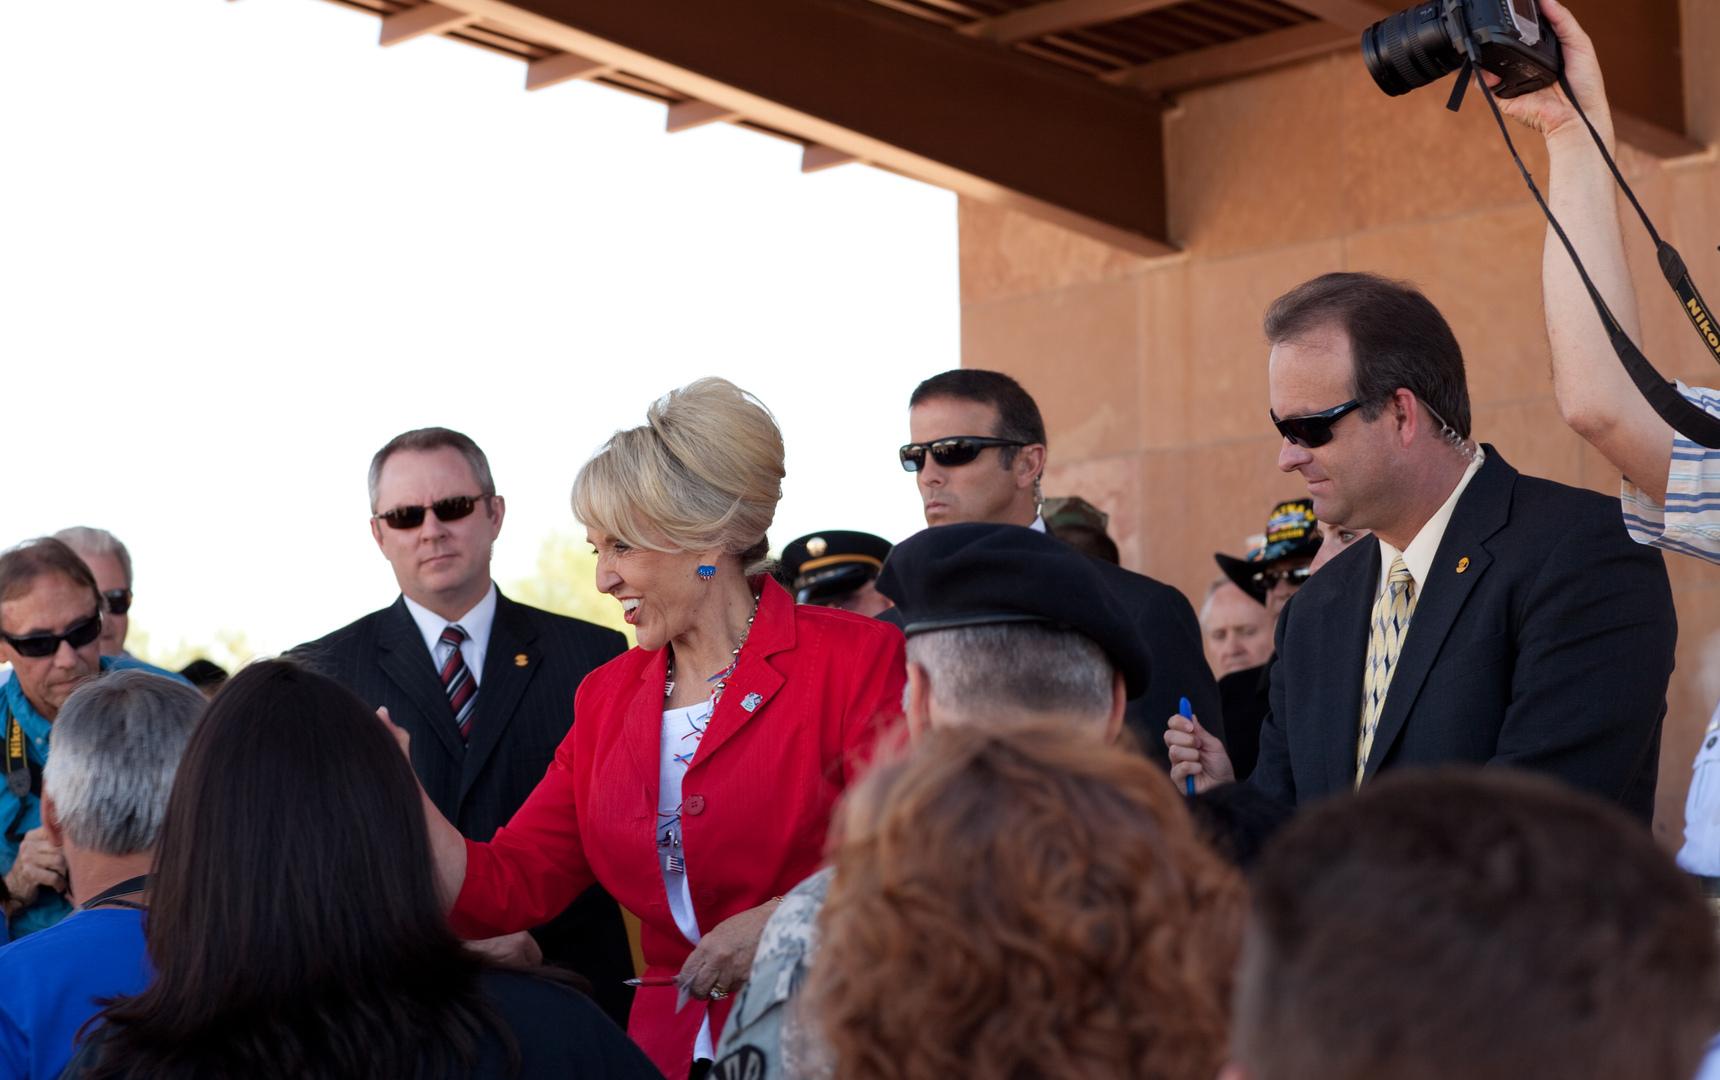 Jan Brewer, Governor of Arizona